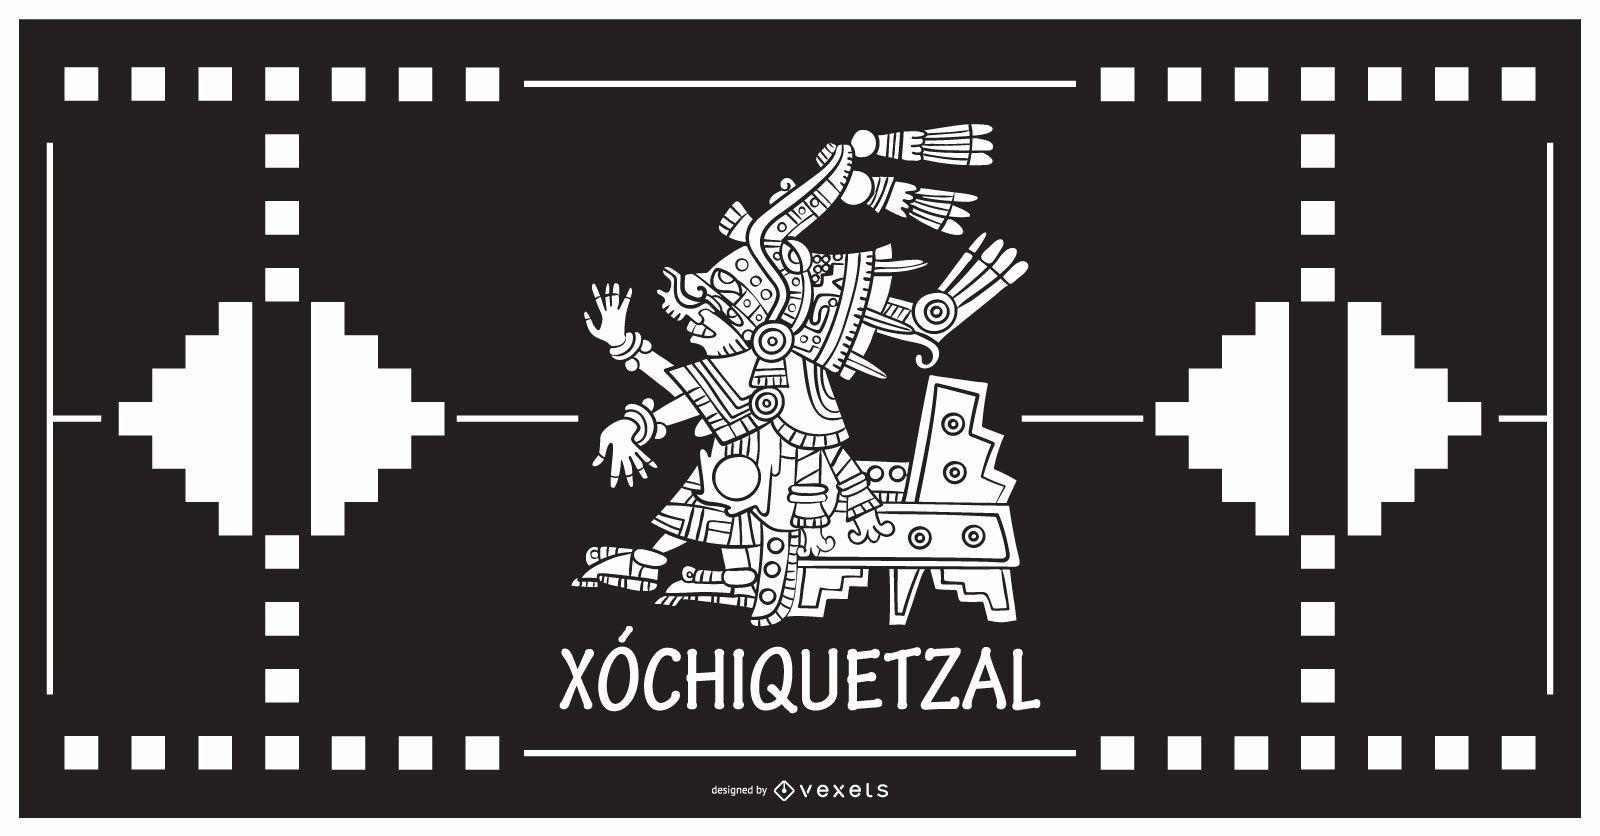 Diseño del dios azteca xochiquetzal